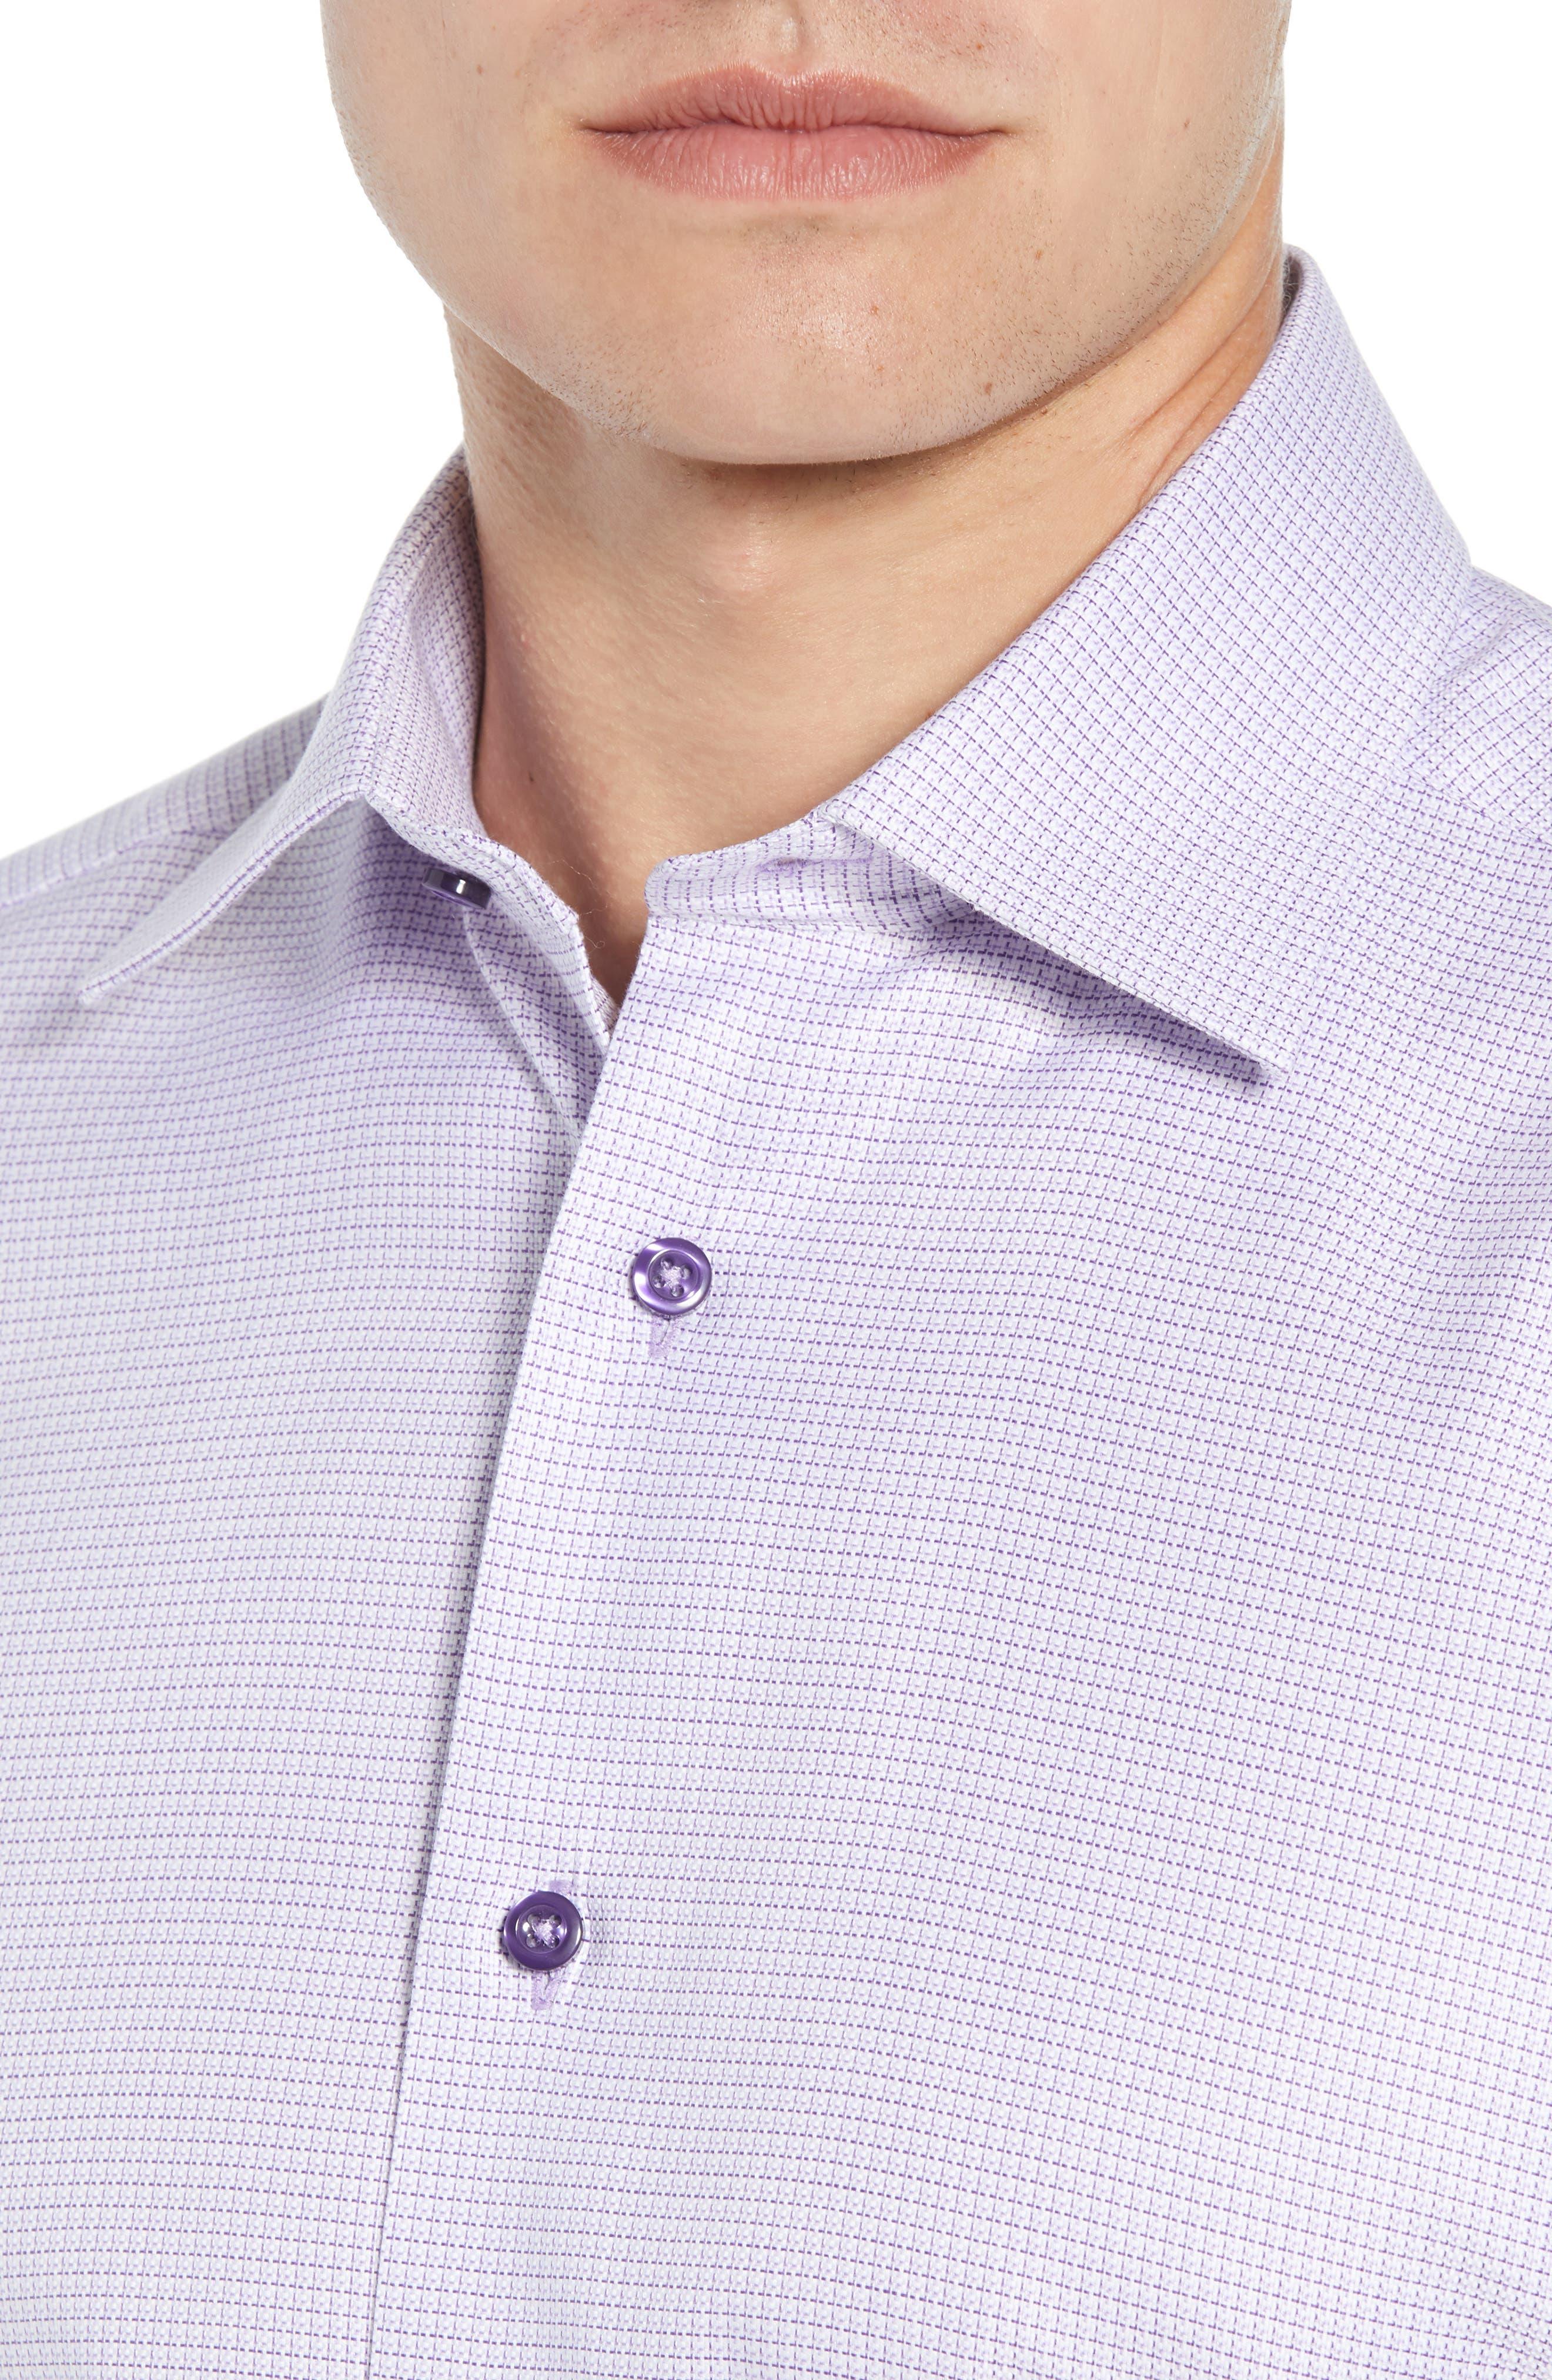 Regular Fit Check Dress Shirt,                             Alternate thumbnail 2, color,                             Lilac